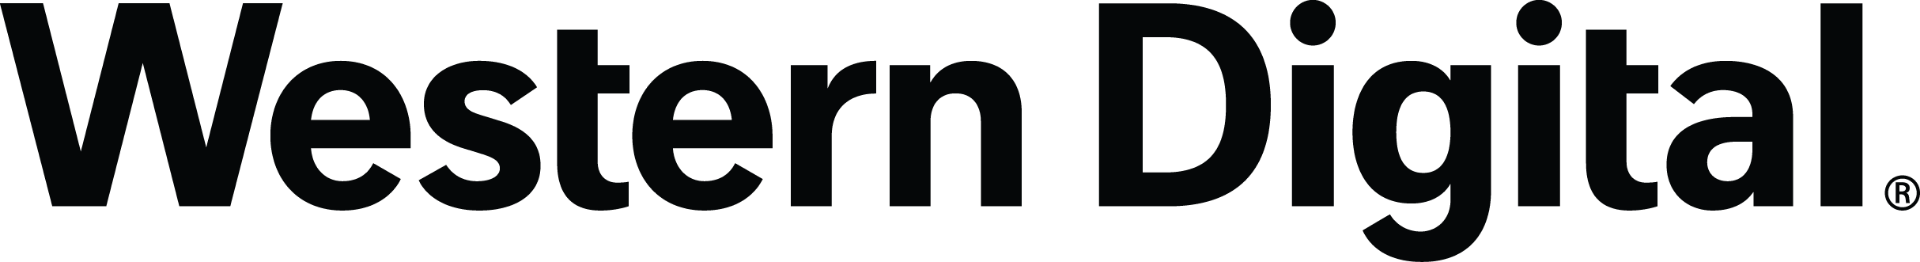 Partnership Company Logo Western Digital ווסטרן דיגיטל